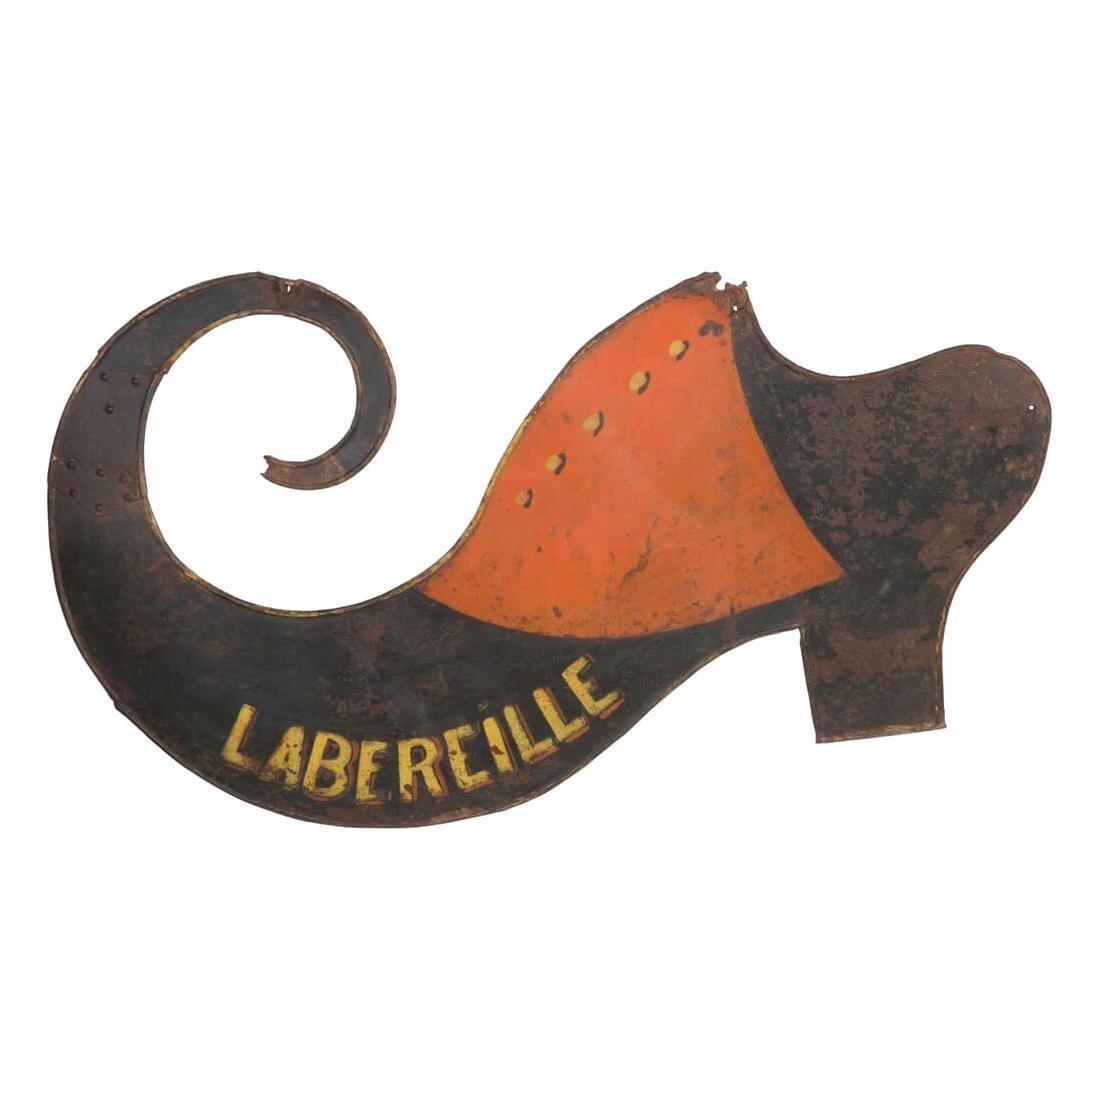 Shoe Maker's Trade Sign